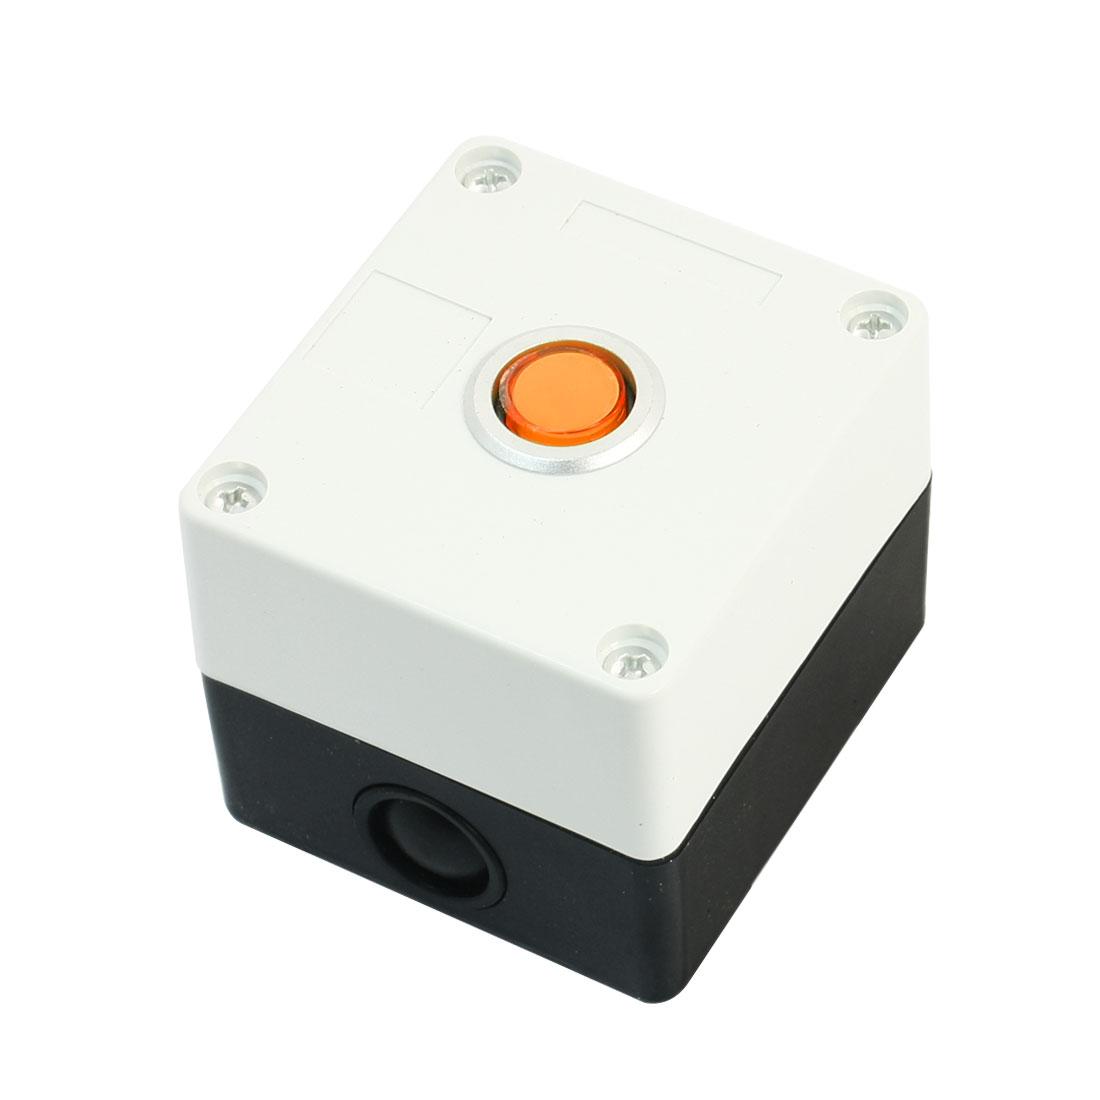 24V Rectangle White Plastic Case Orange Accident Signal Indicator Light Pilot Lamp Control Station Box